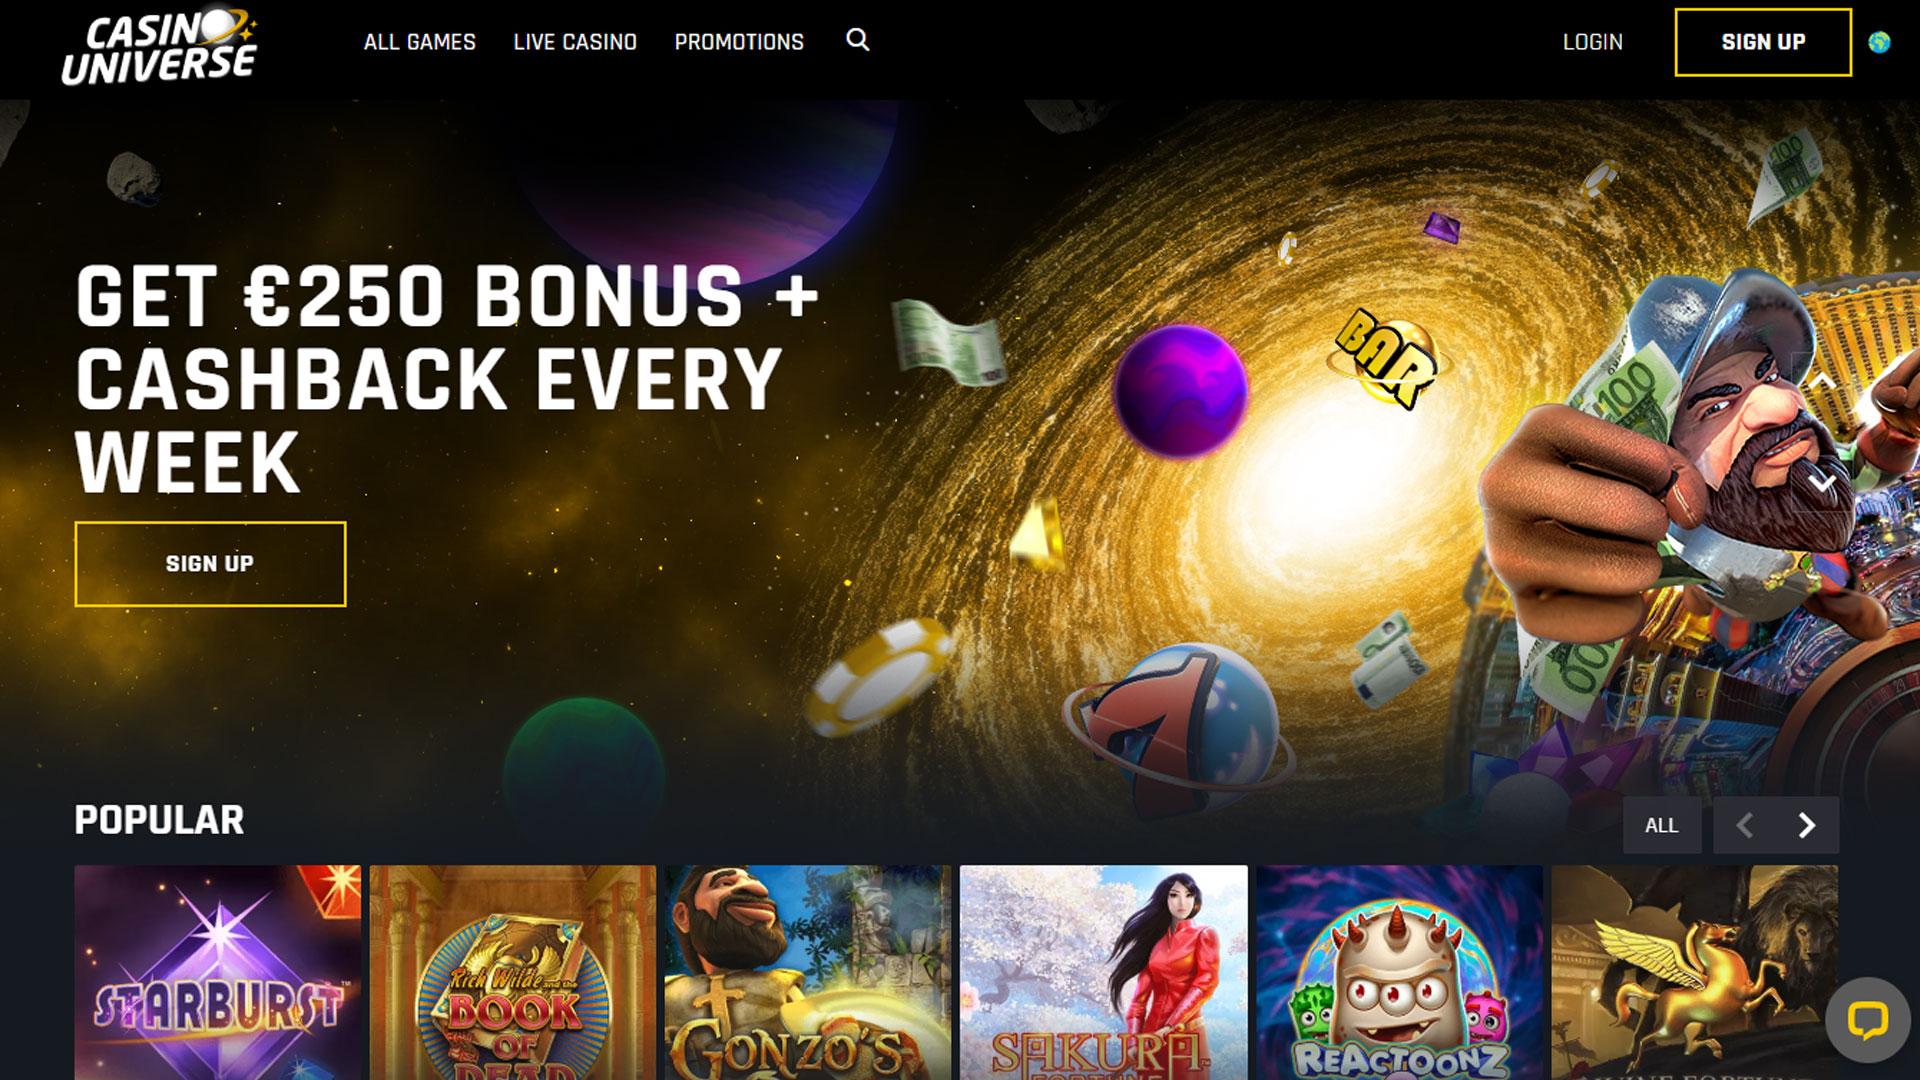 Casino Universe Casino screenshot